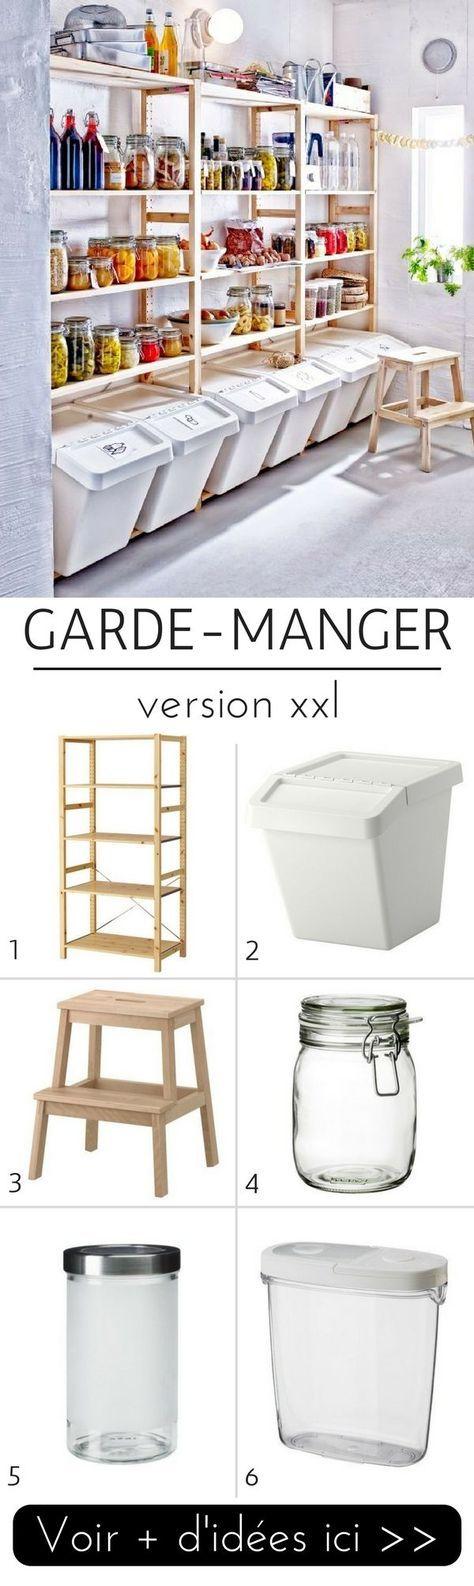 Grande garde-manger IKEA  http://www.homelisty.com/idees-garde-manger/